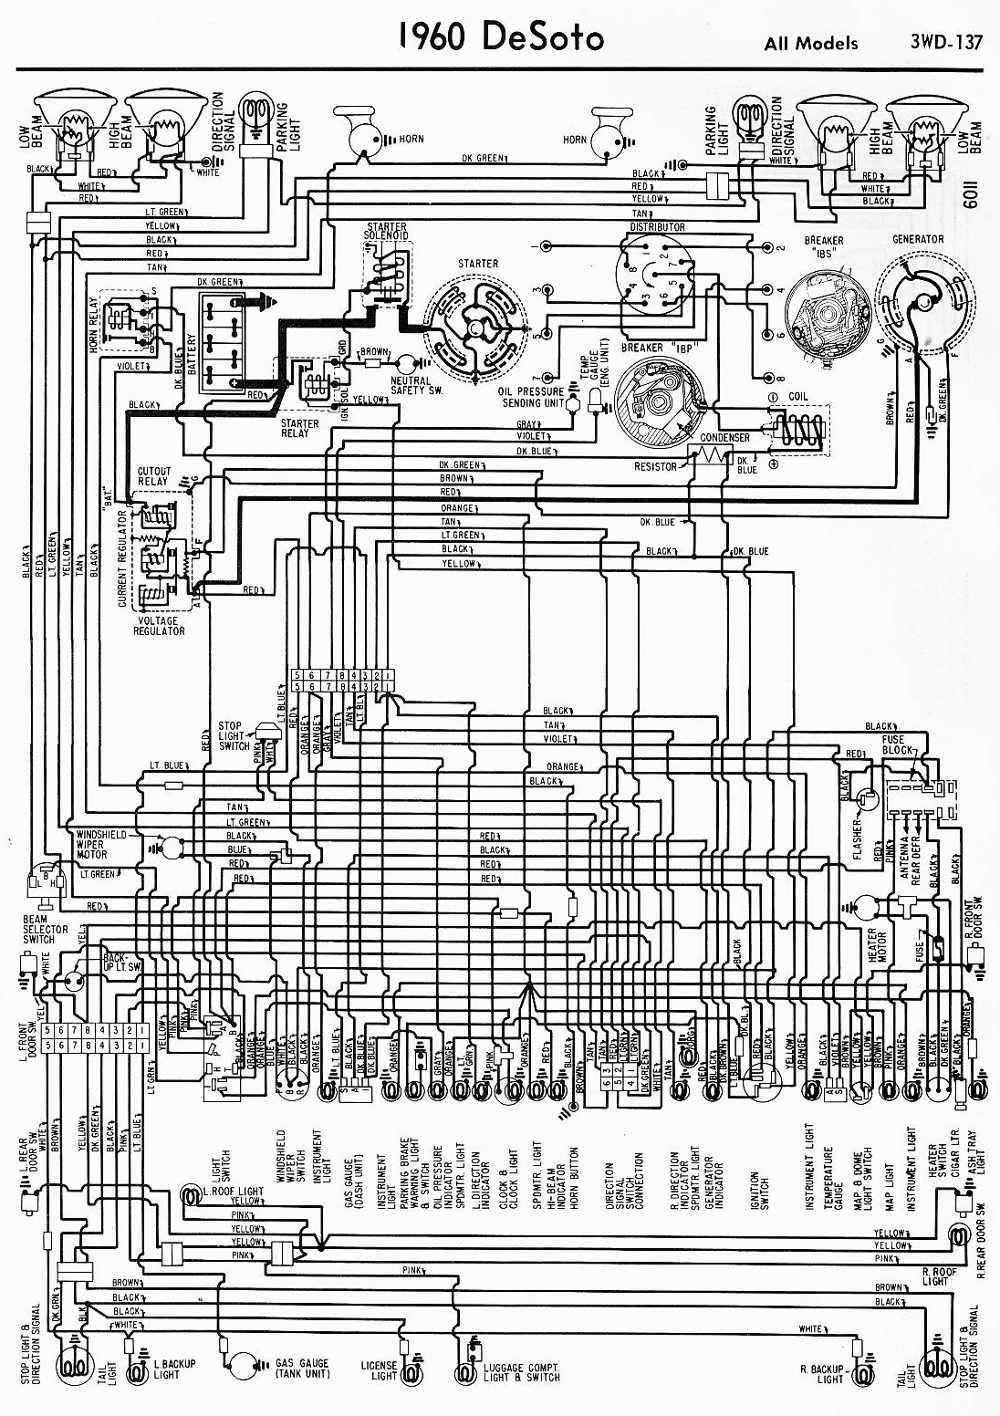 1960 desoto wiring diagram